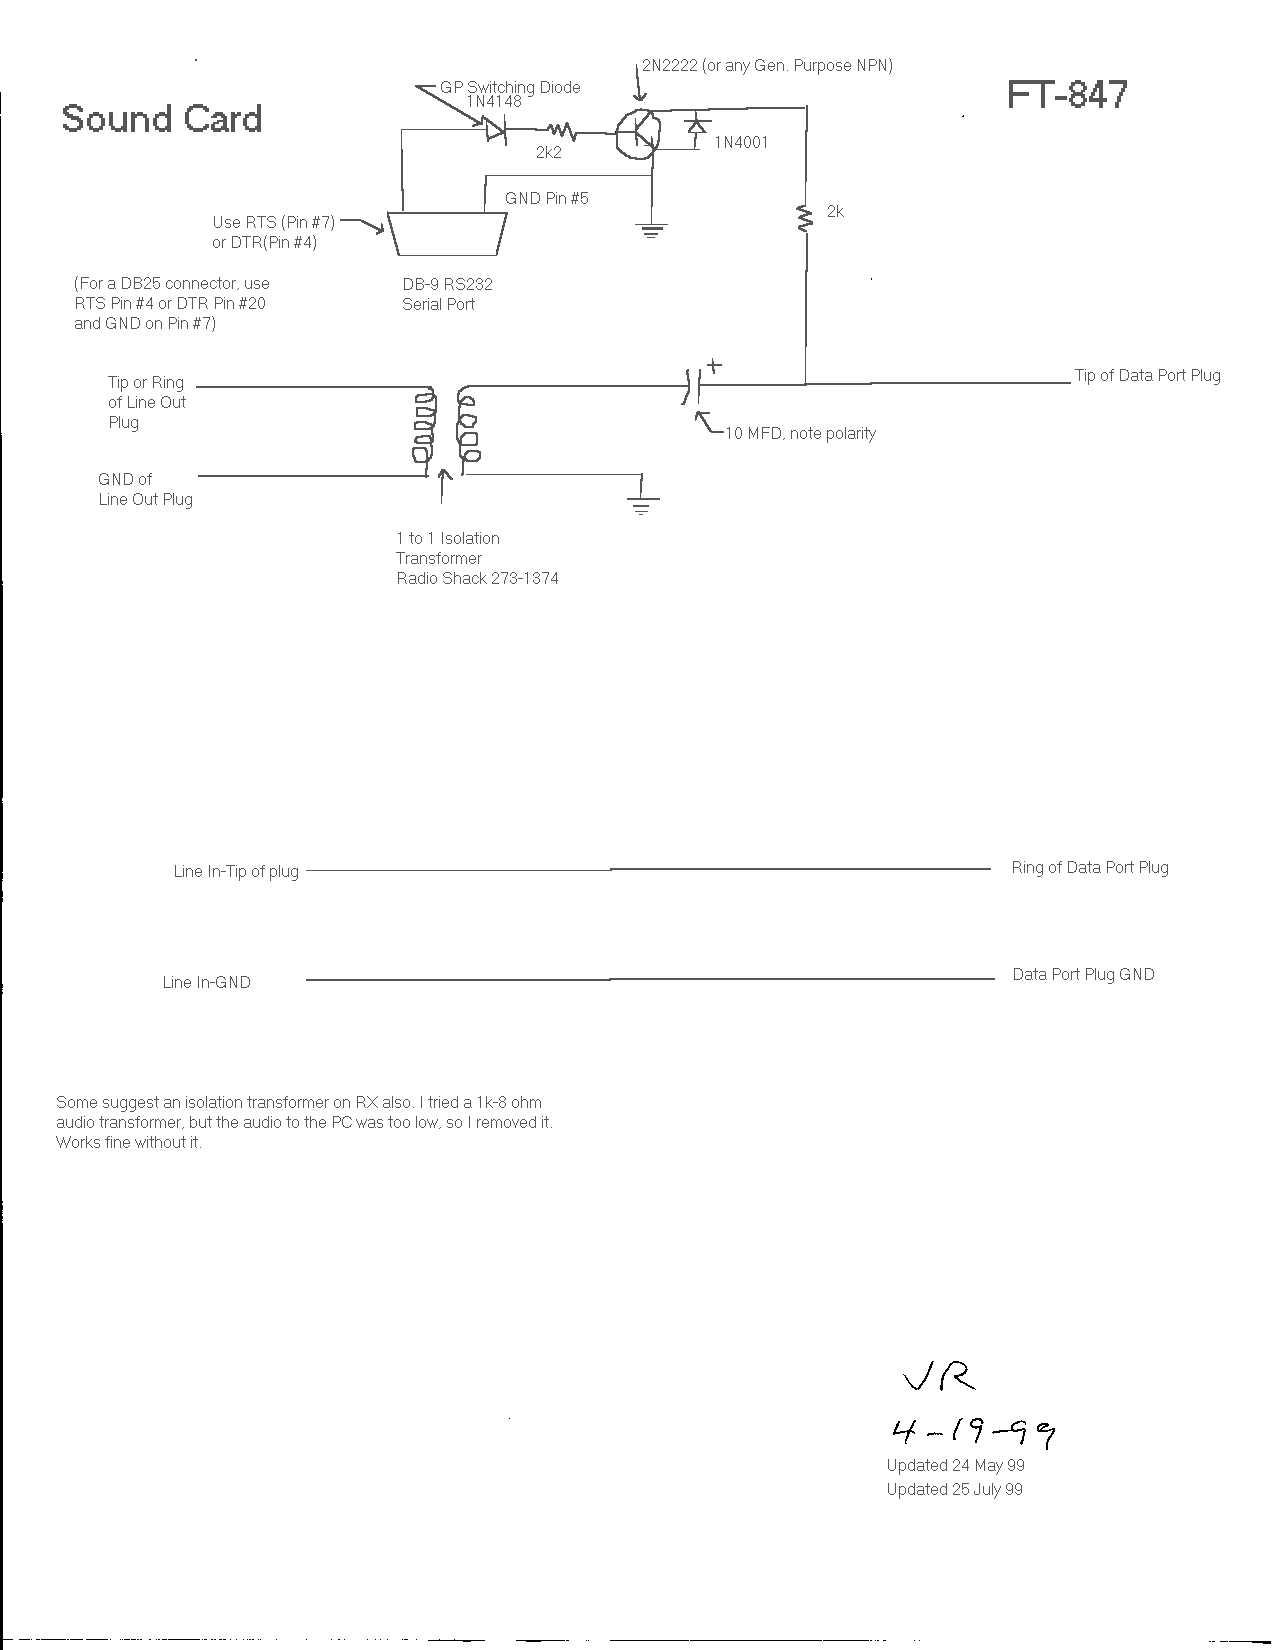 Ft847 To Computer Basic Vox Circuit Controls Ptt Http Supercontrolde Cat Ft847faq Interface